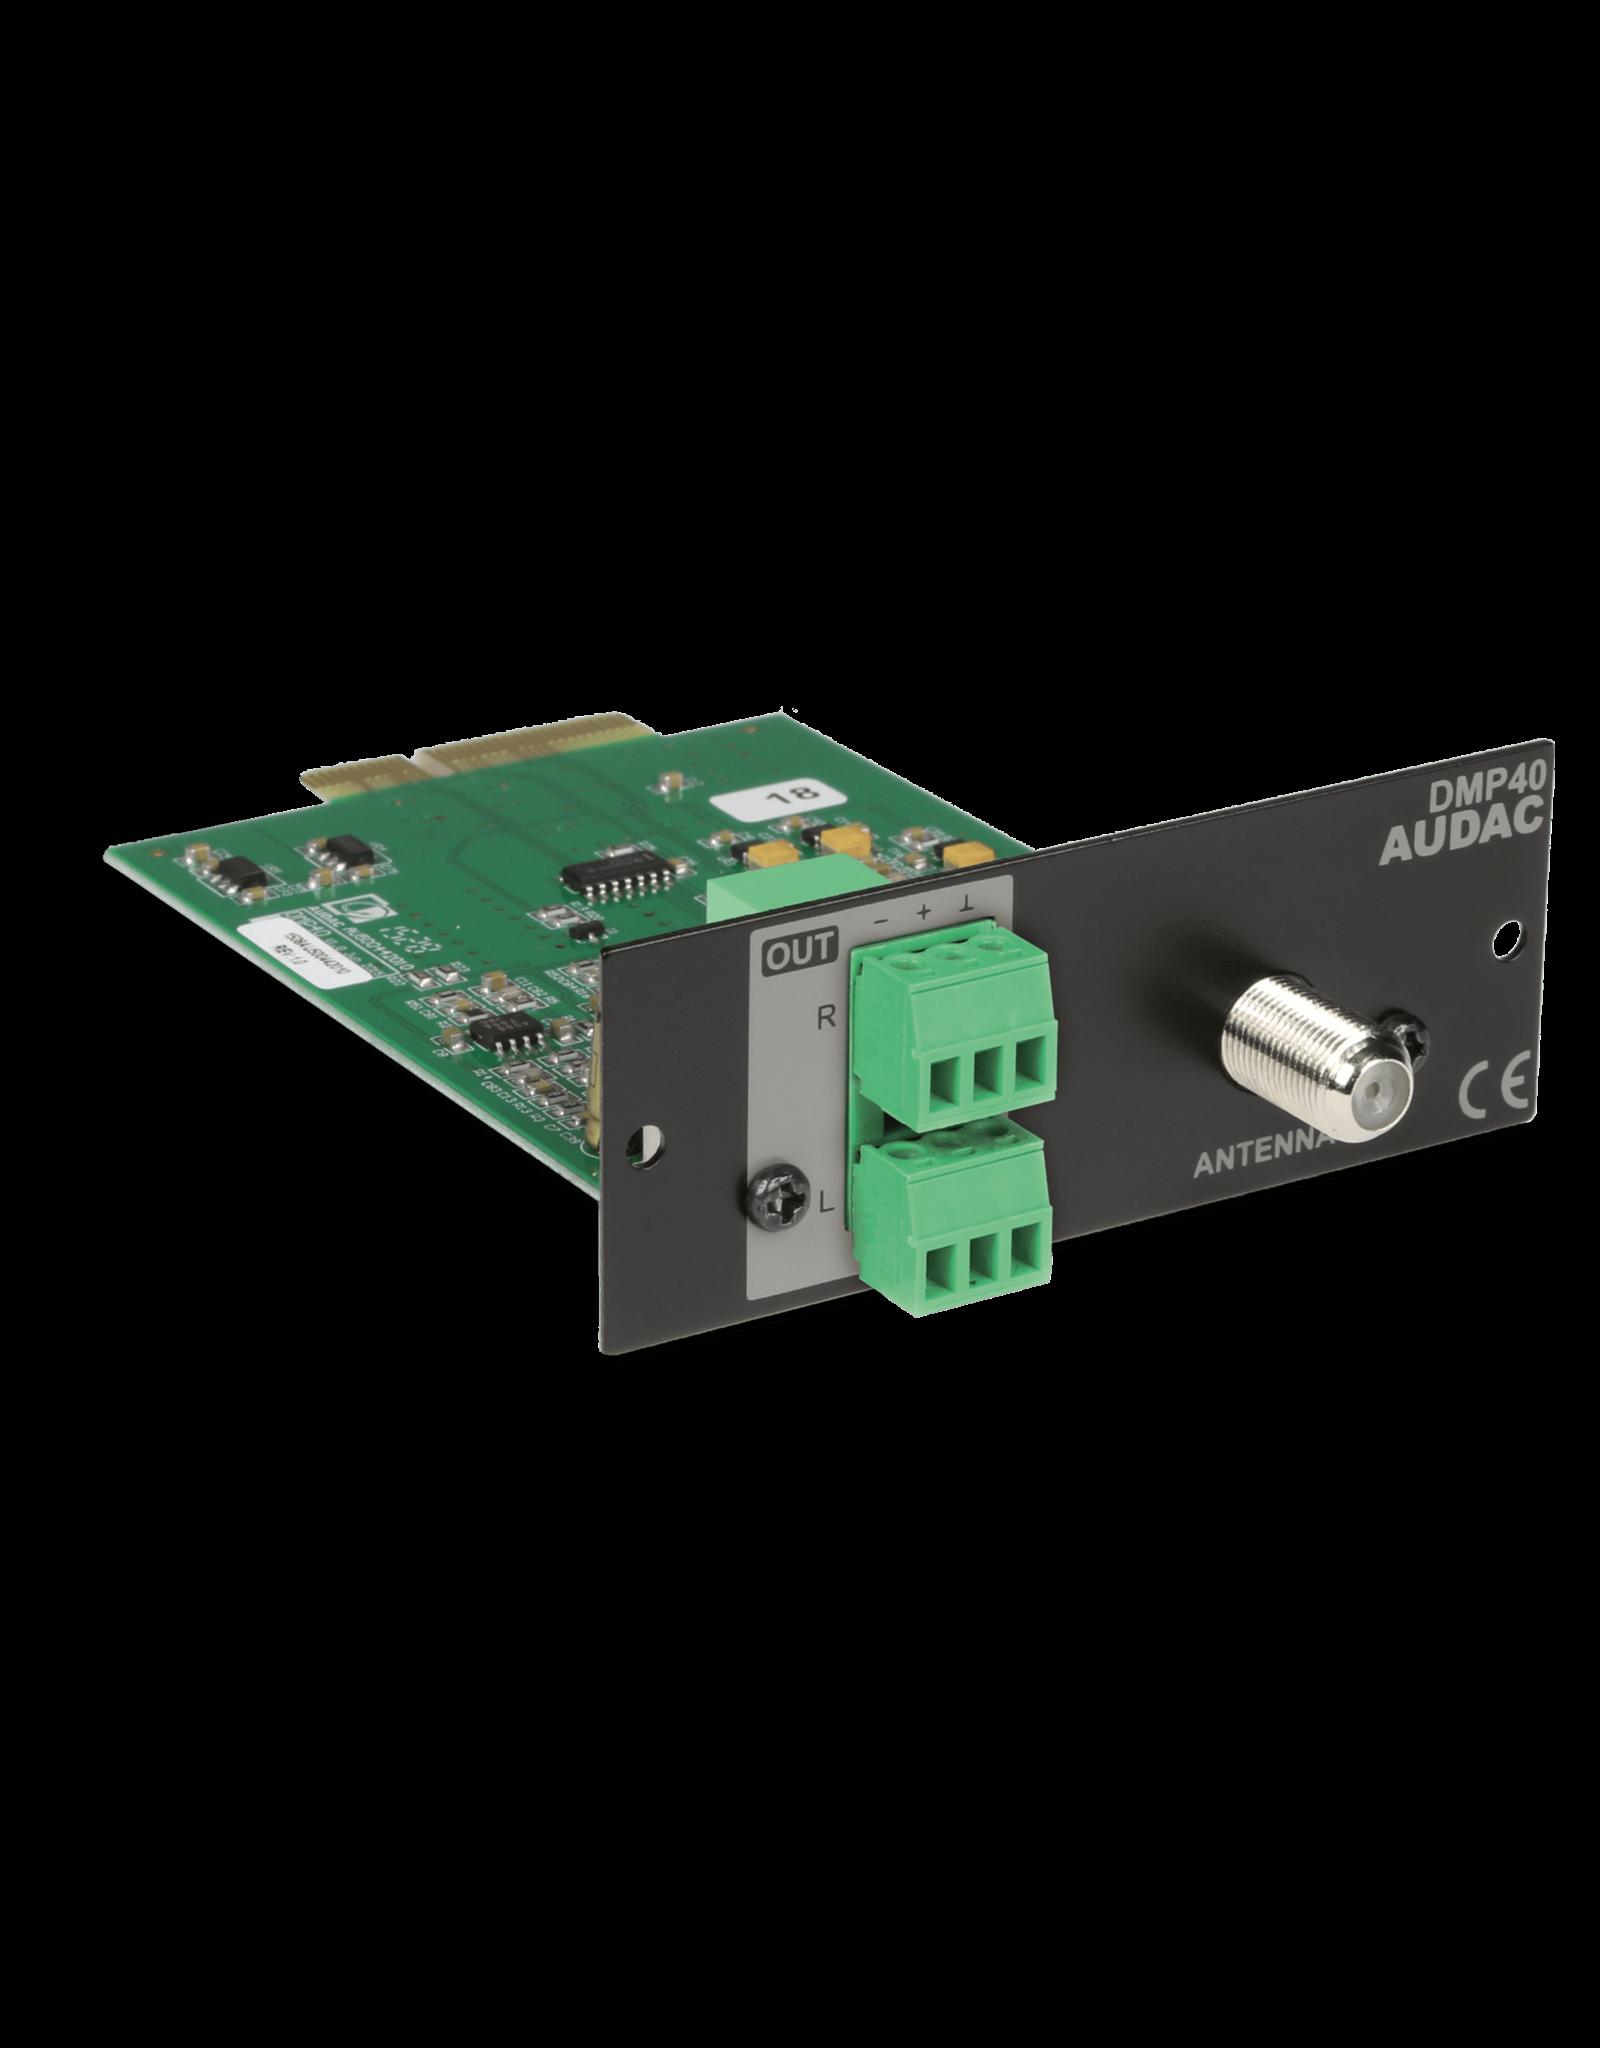 Audac SourceCon™ DAB/DAB+ & FM tuner module